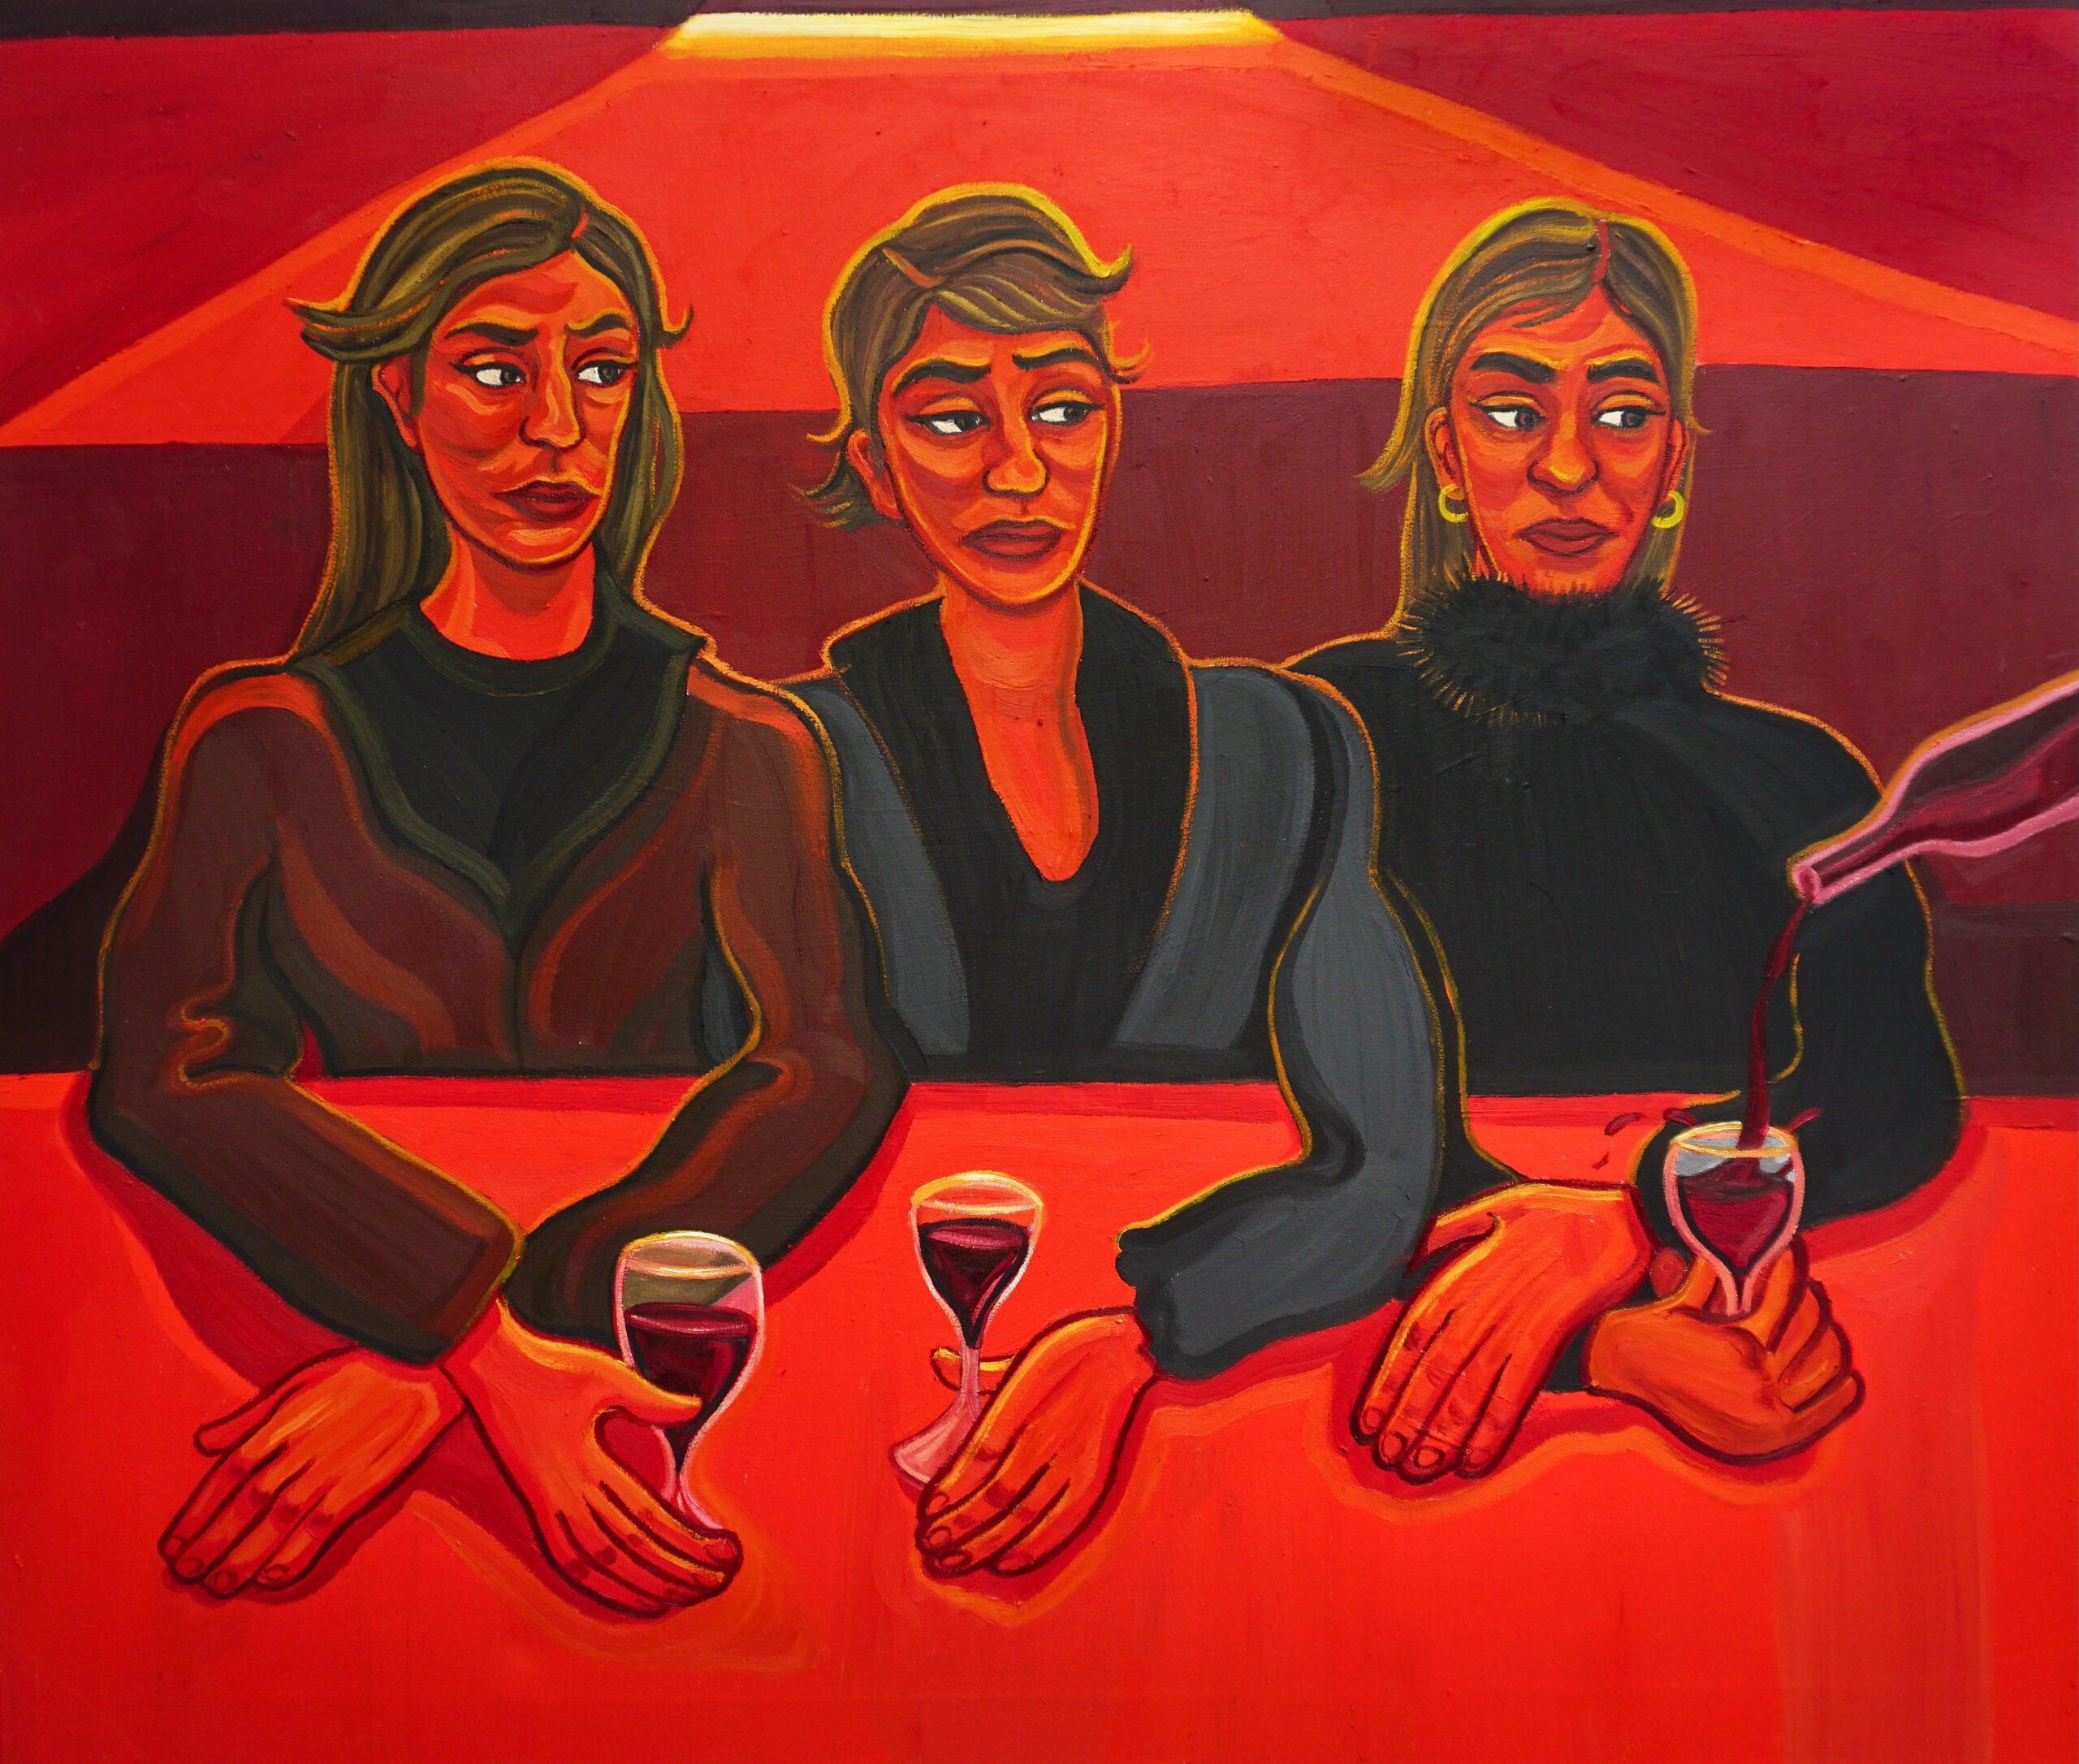 Red Wine Ladies, 2021, 140 x 120 cm, oil on canvas